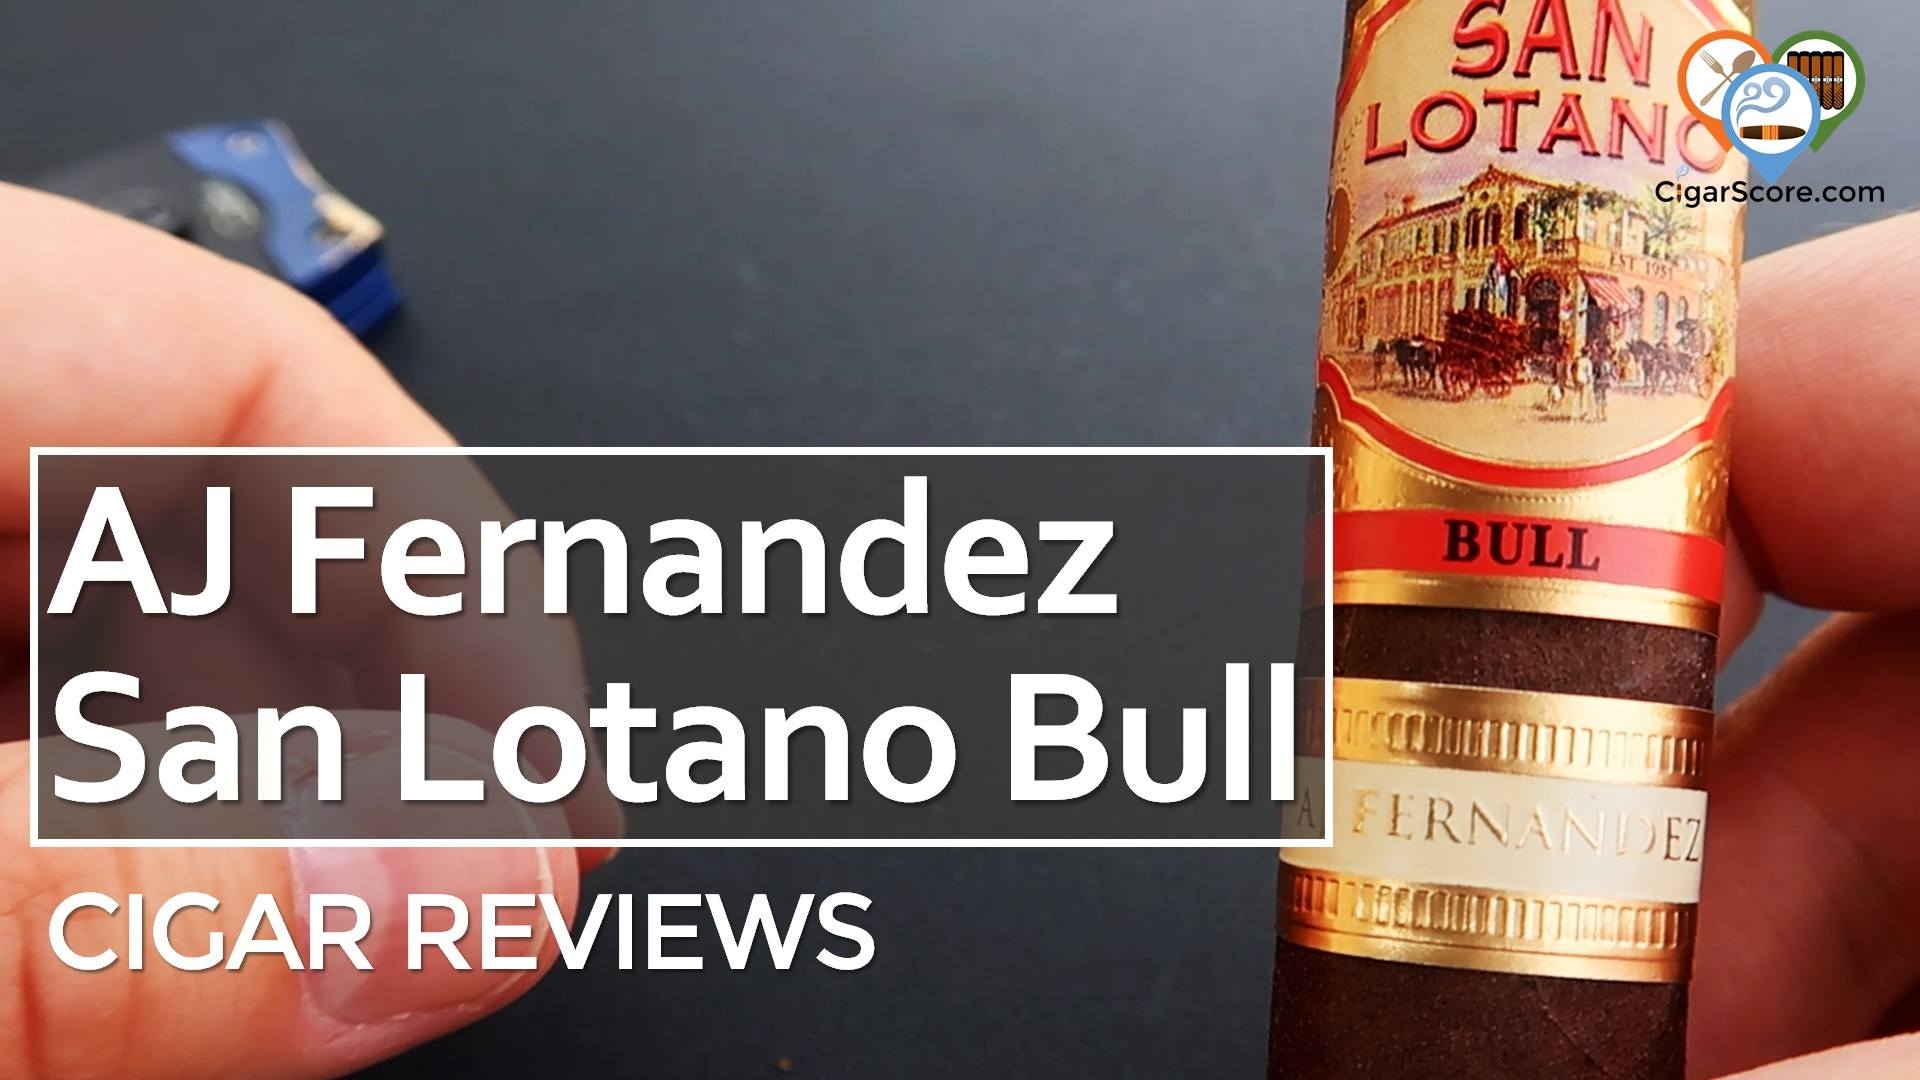 Cigar Review AJ Fernandez San Lotano Bull Robusto